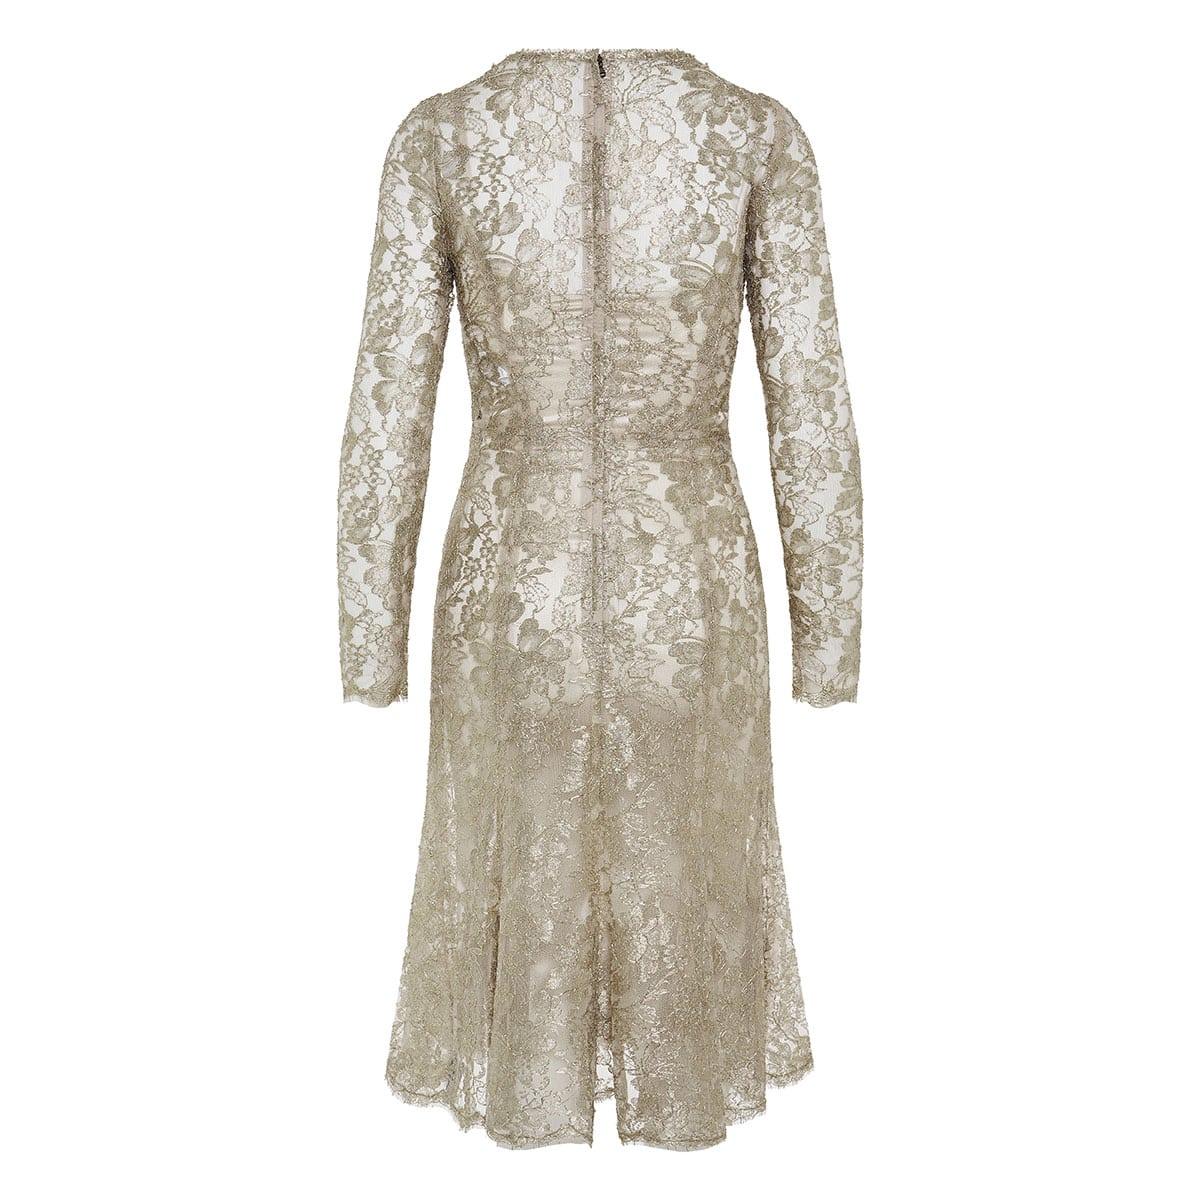 Metallic lace midi dress